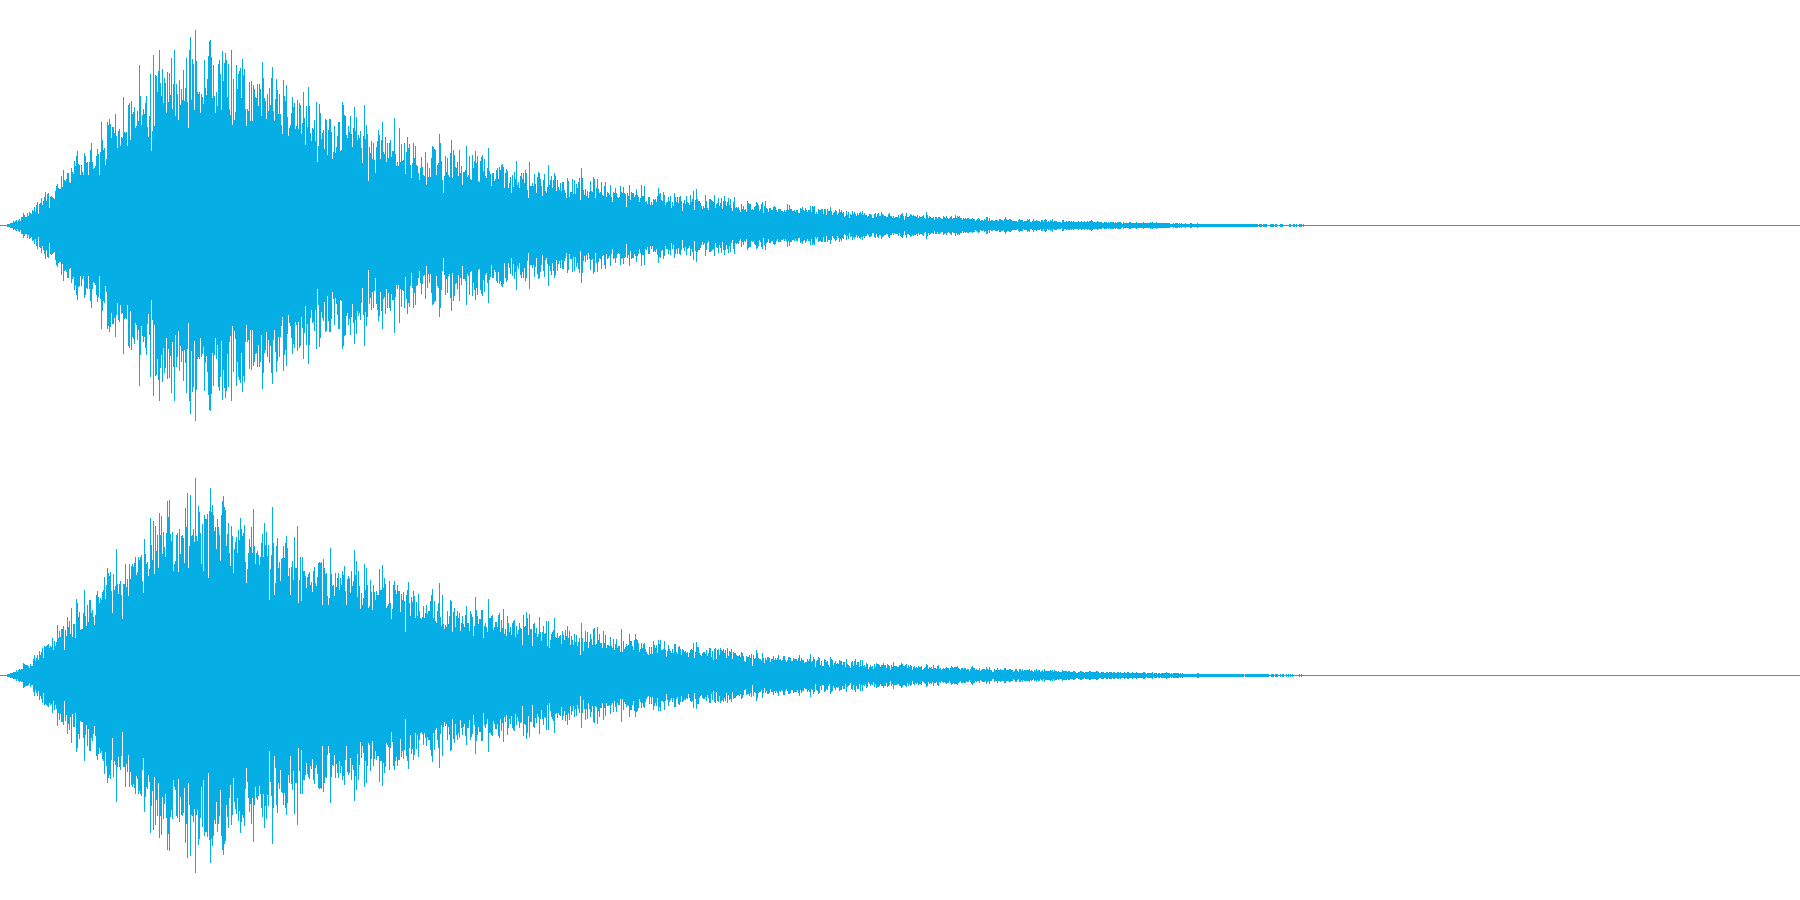 Noise 攻撃をかわす・逃げるSFXの再生済みの波形